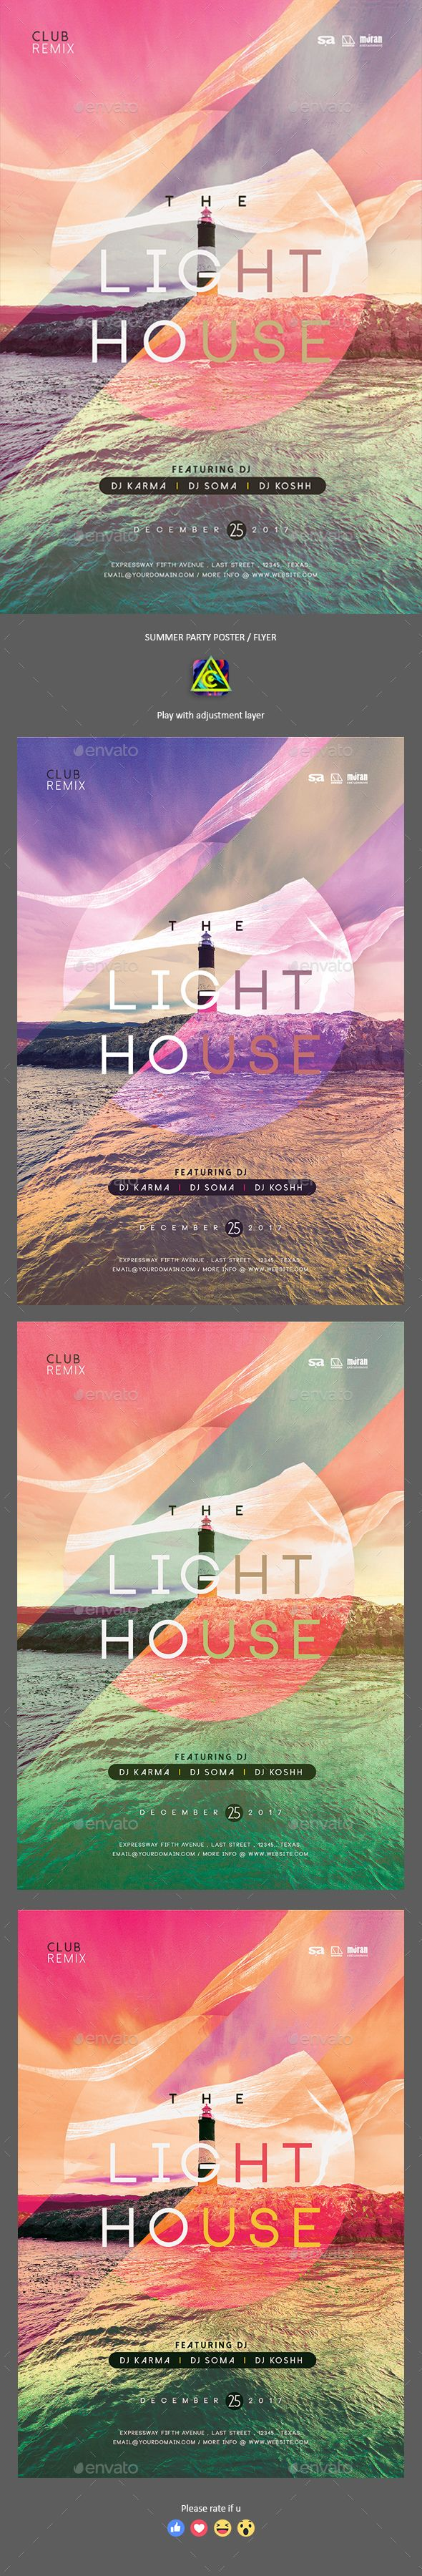 The Light House Summer Poster / Flyer